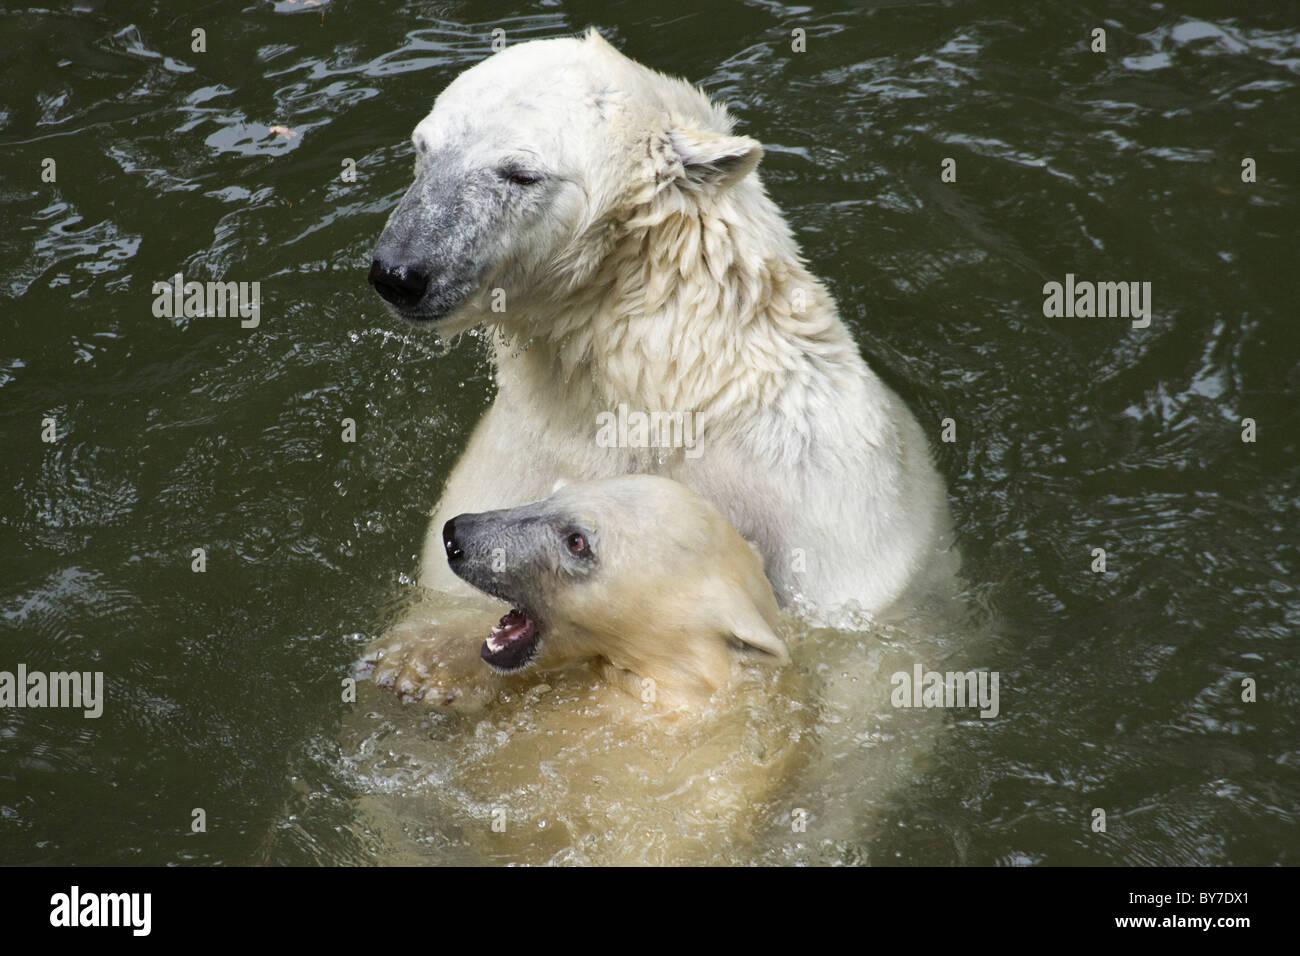 Polar Bear with kid (Ursus maritimus, Thalarctos maritimus) in water - Stock Image